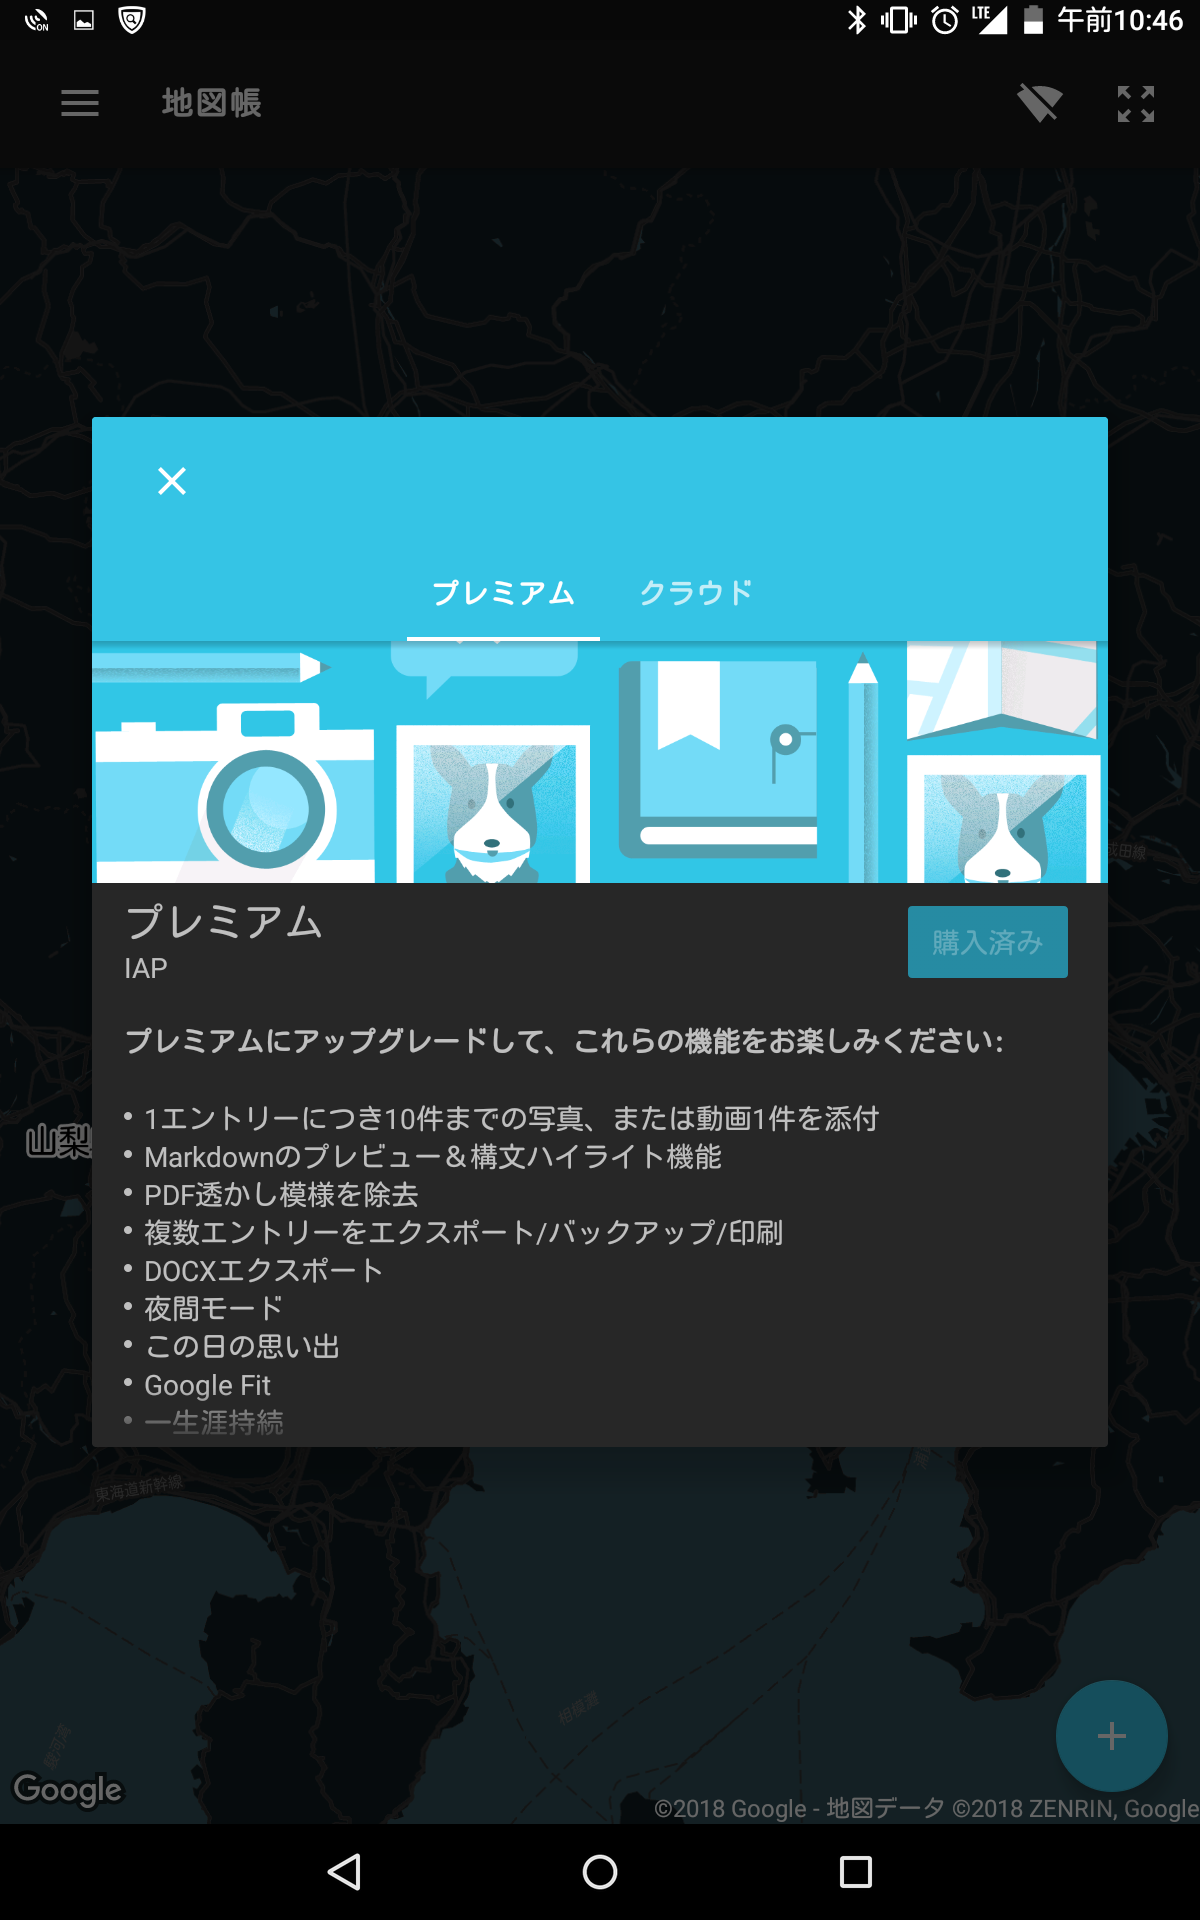 Screenshot_2018-04-17-10-46-04.png